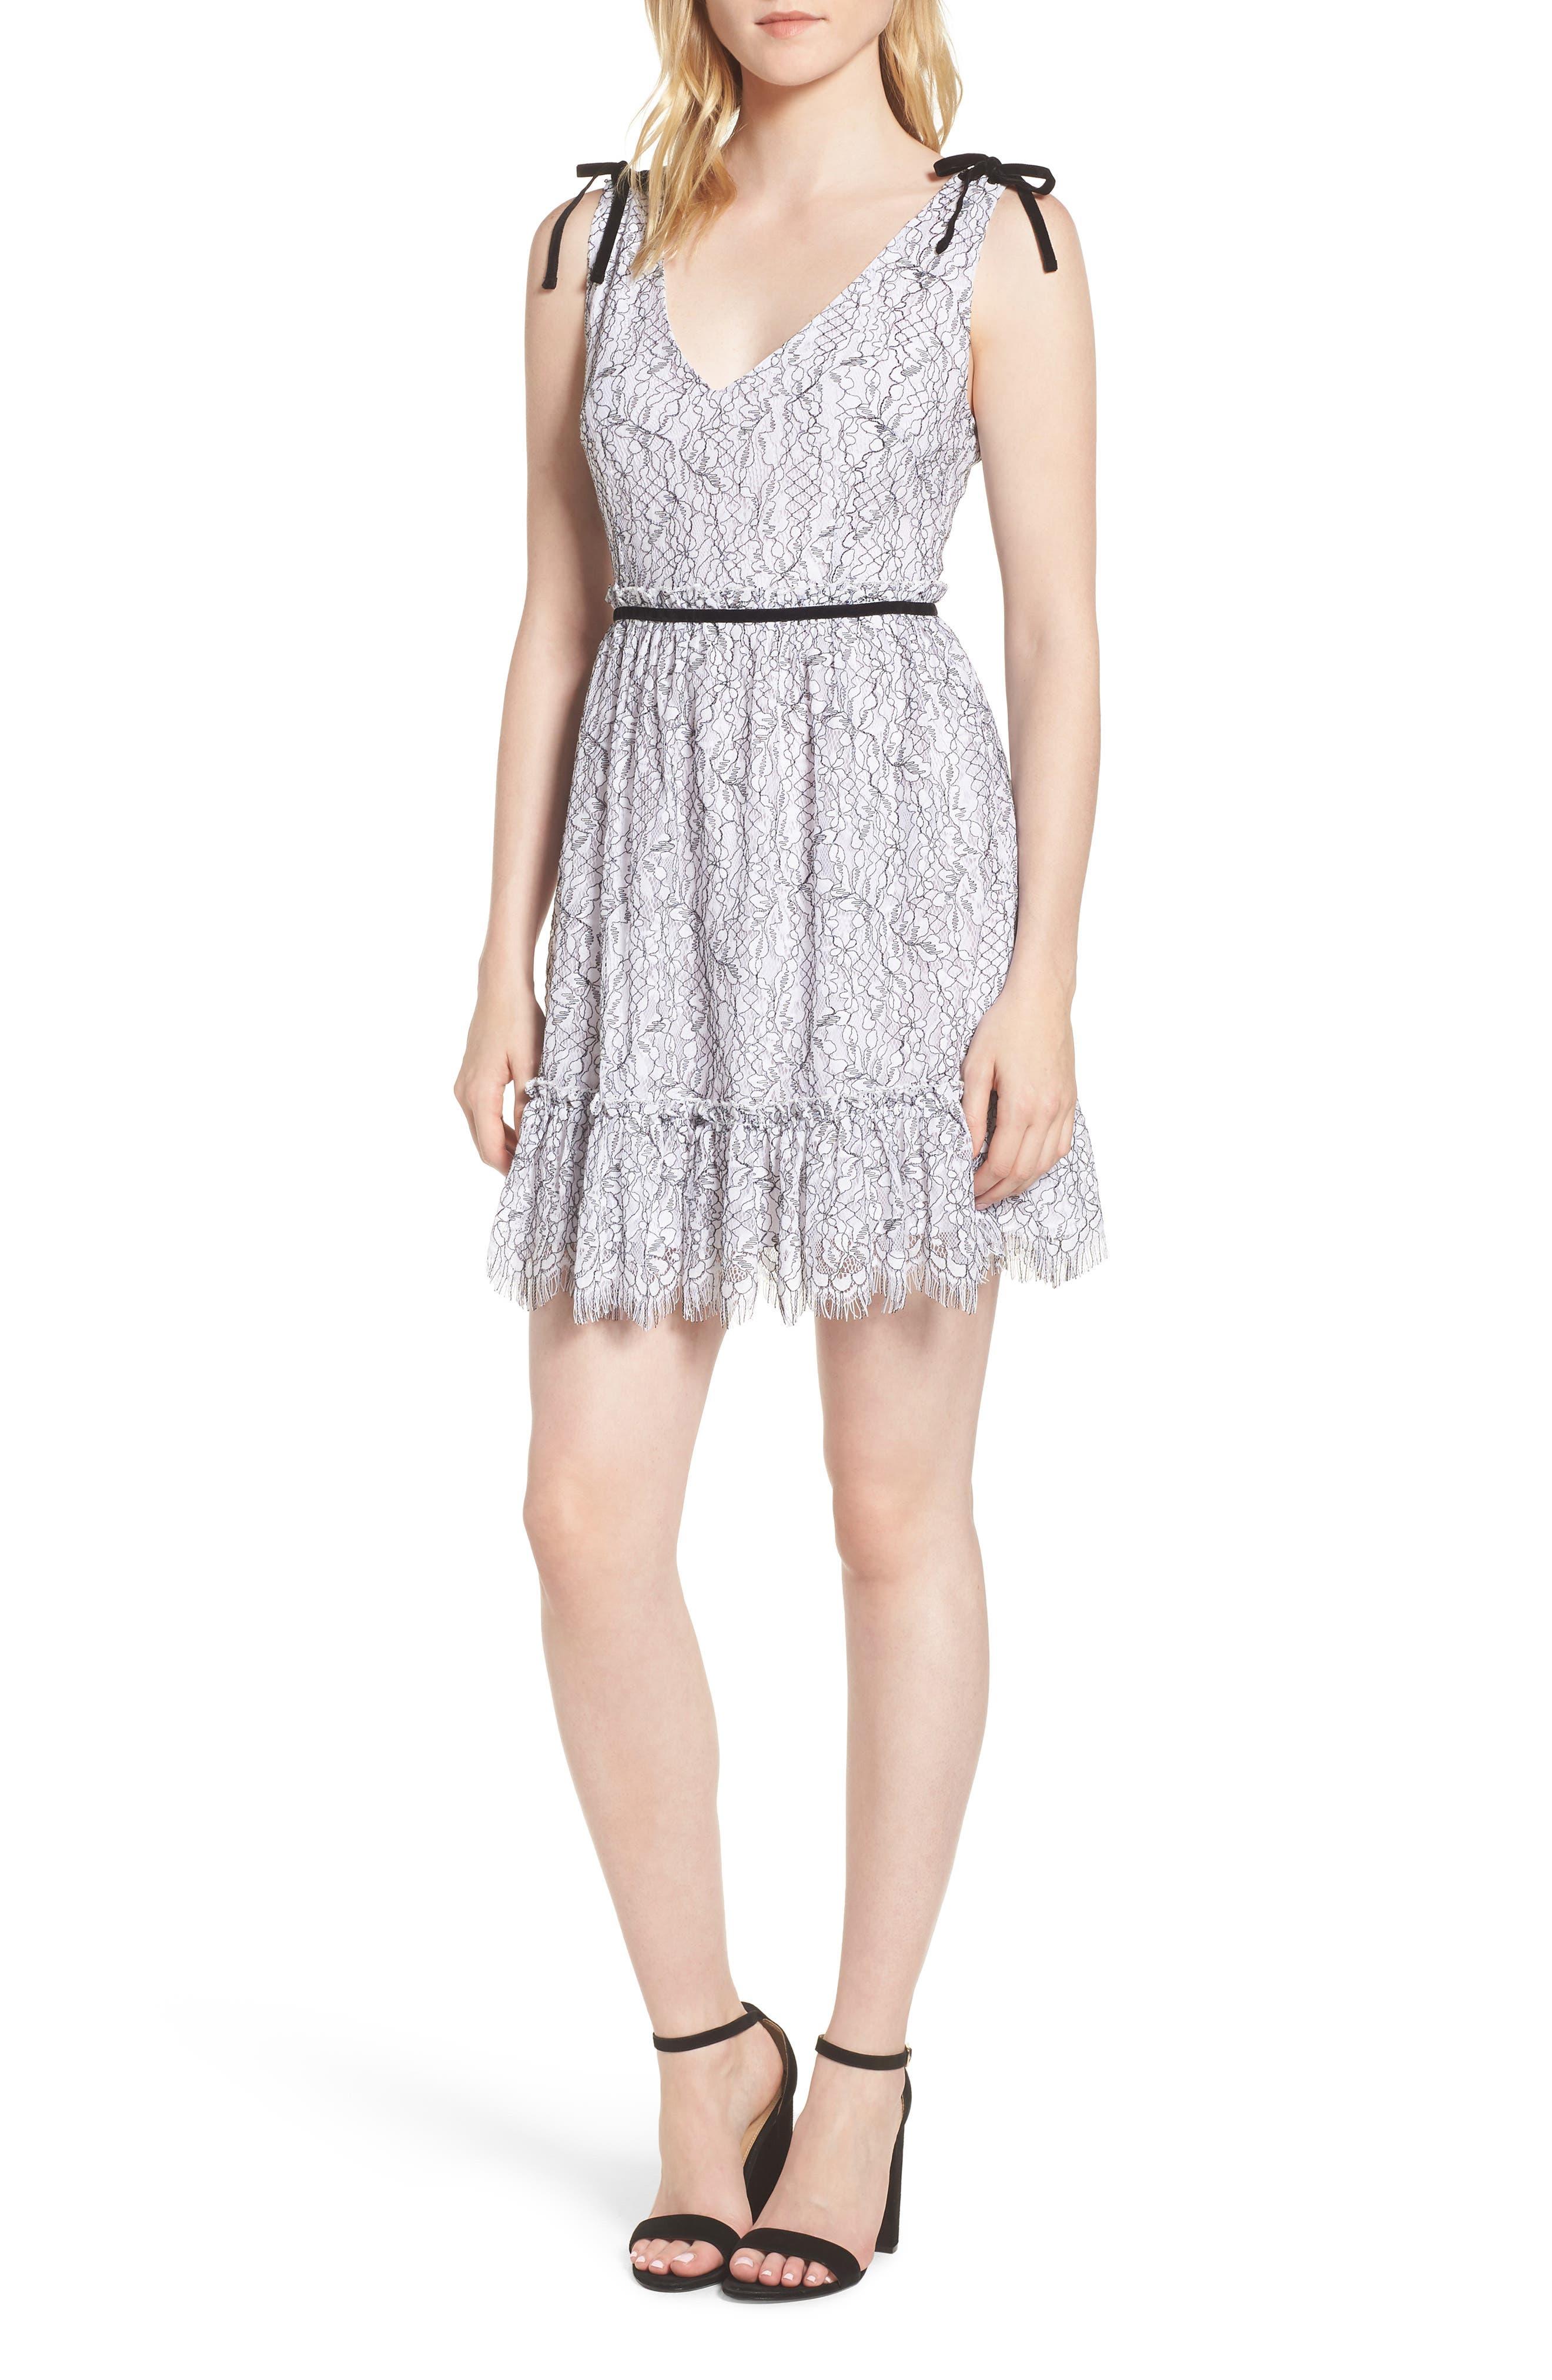 Ezzy Lace Dress,                             Main thumbnail 1, color,                             Ivory